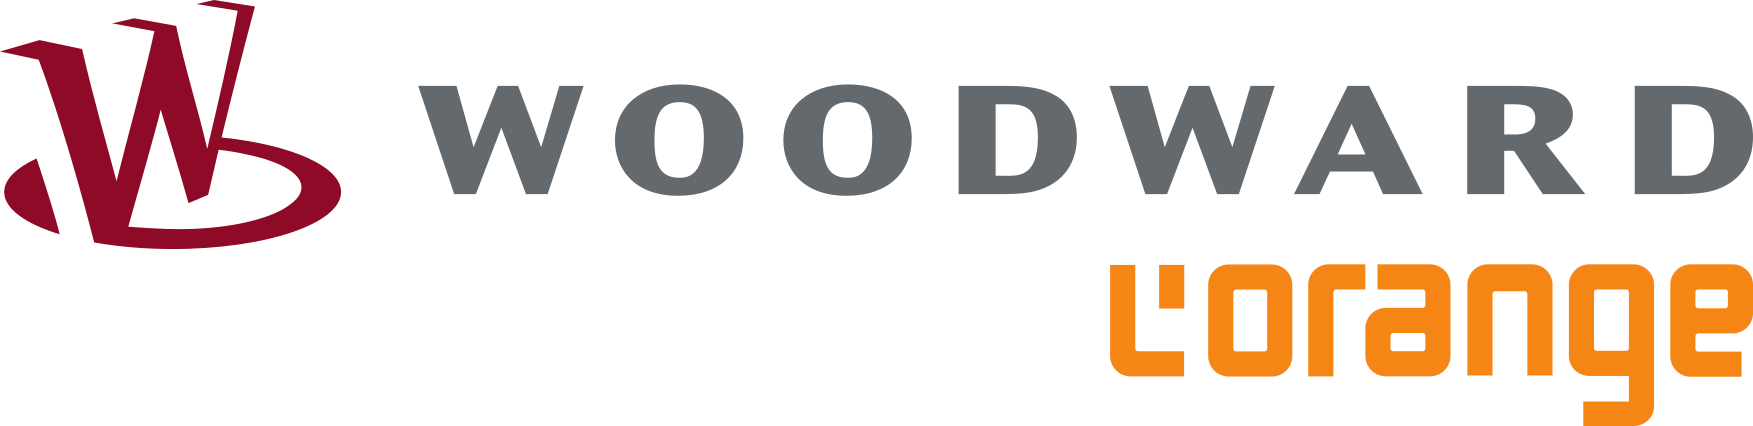 Woodward L-Orange